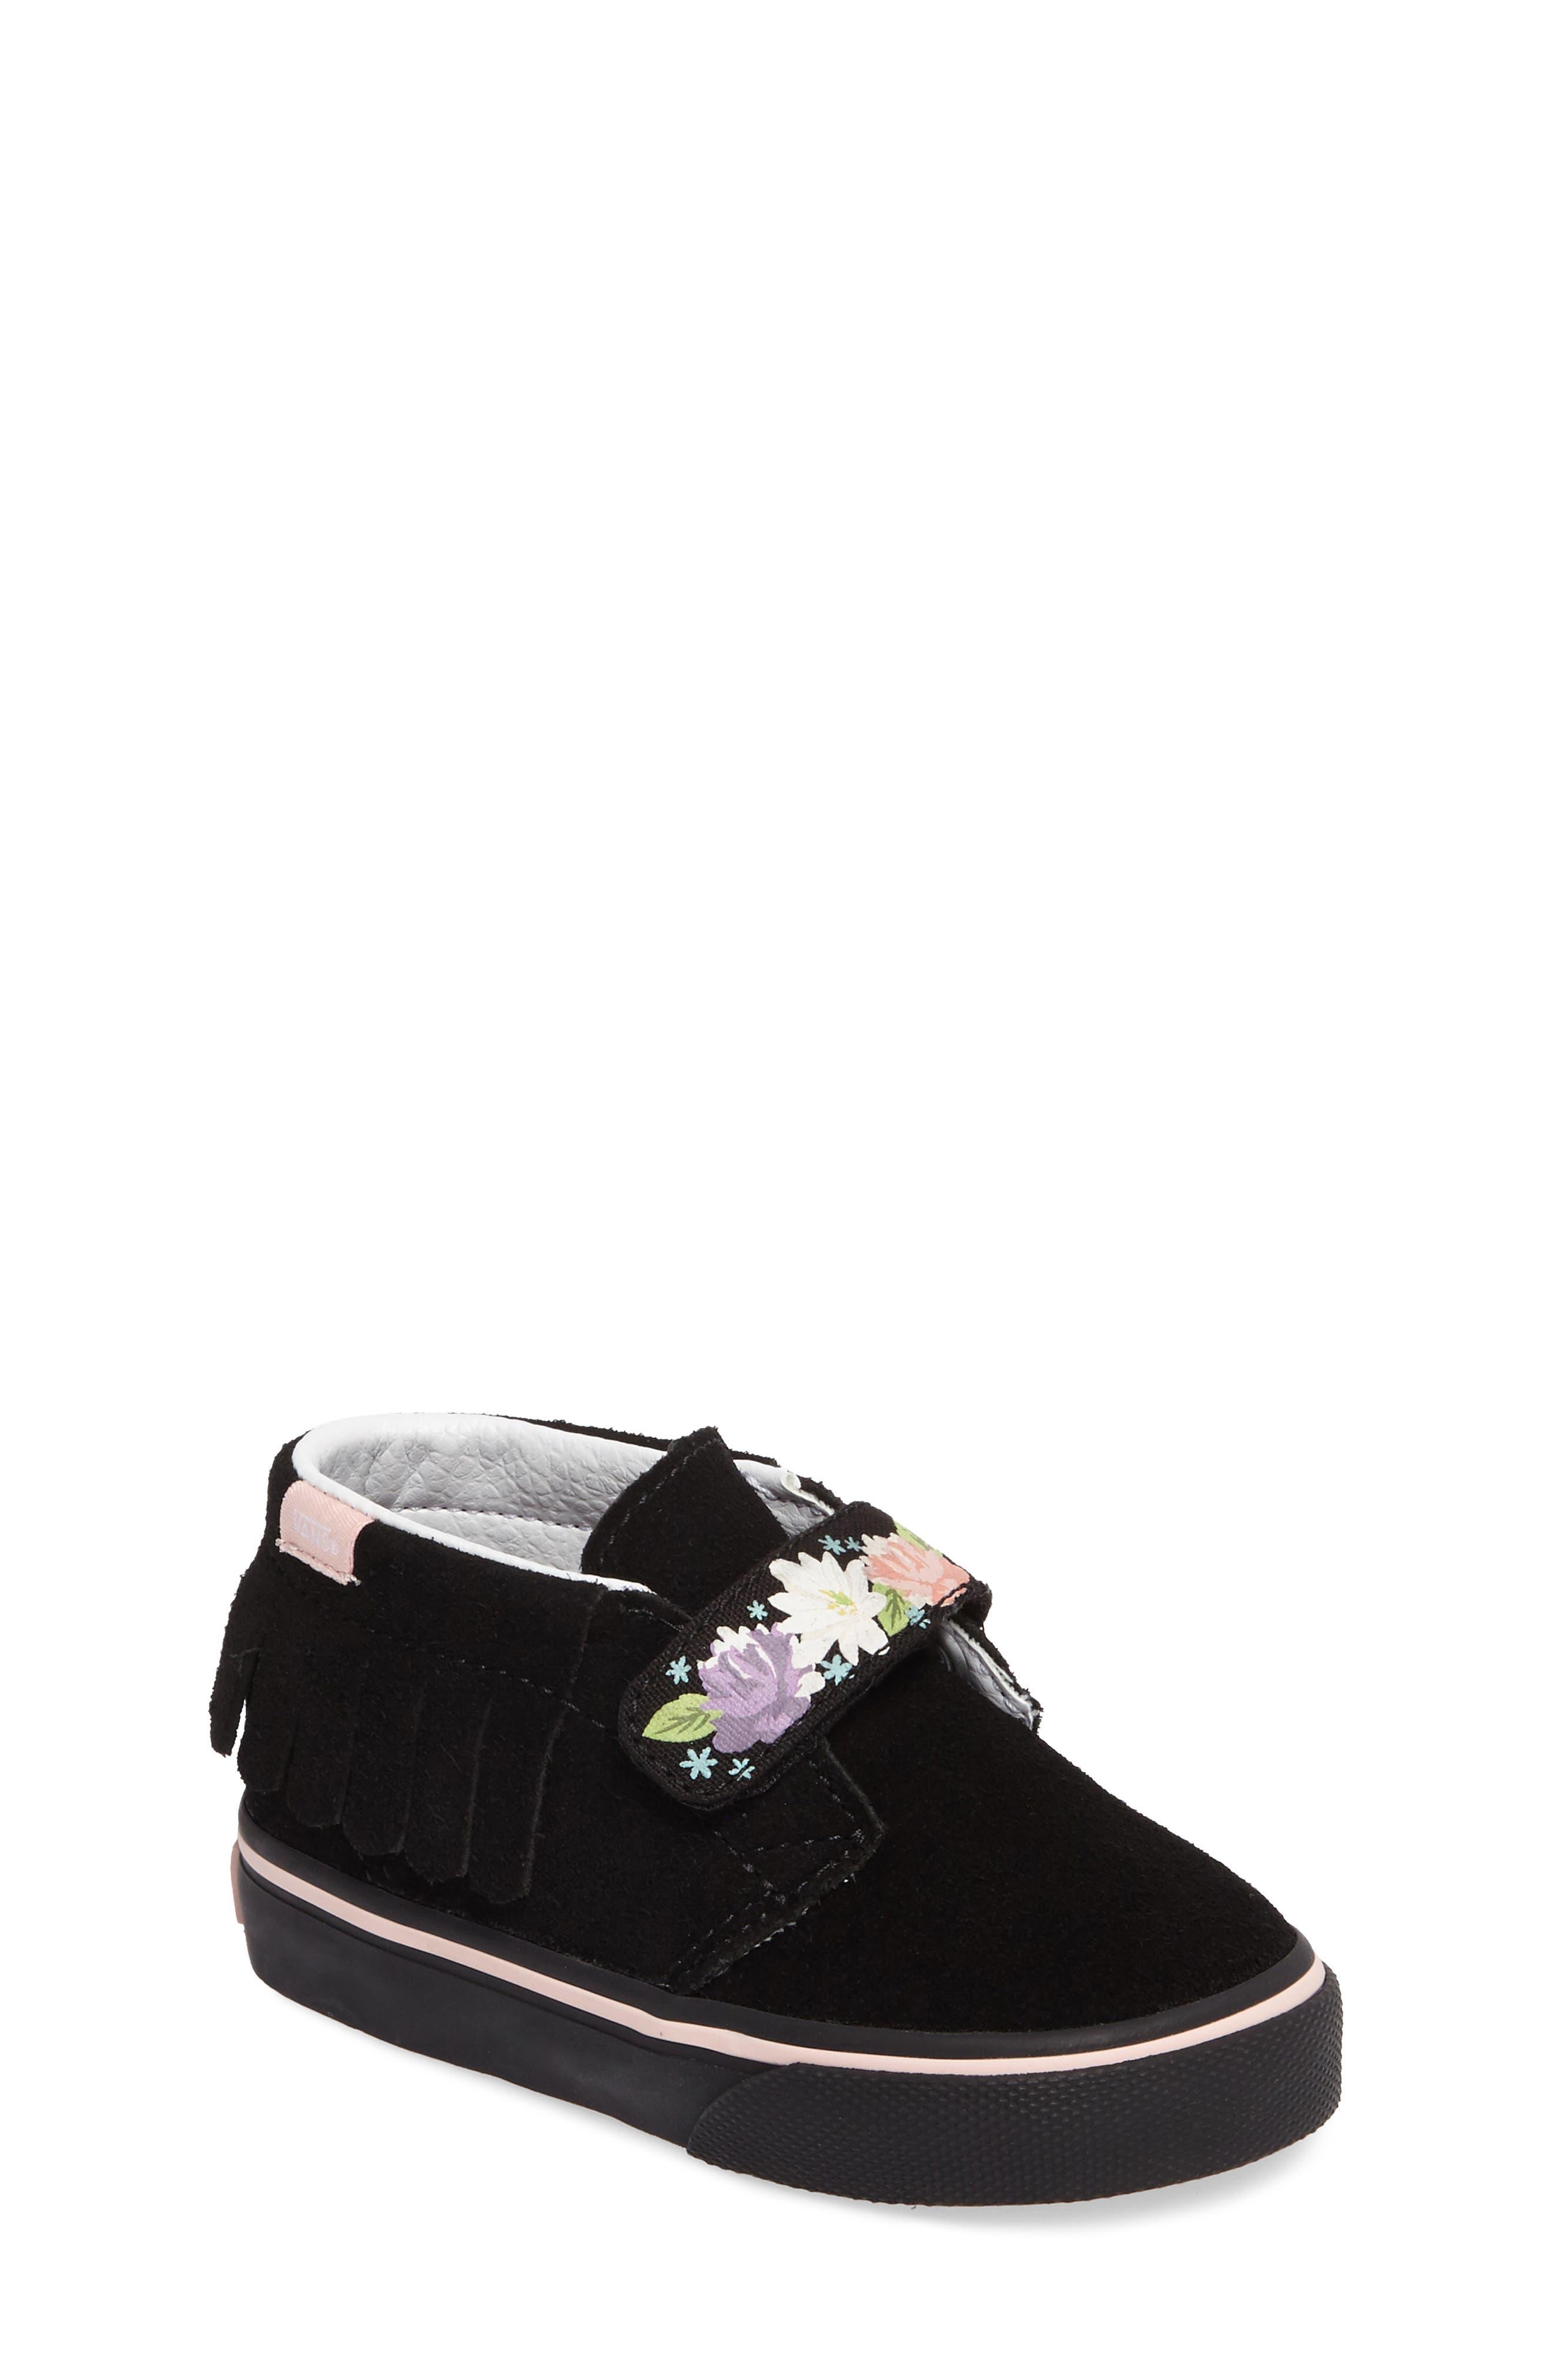 Chukka V Moc Sneaker,                             Main thumbnail 1, color,                             001